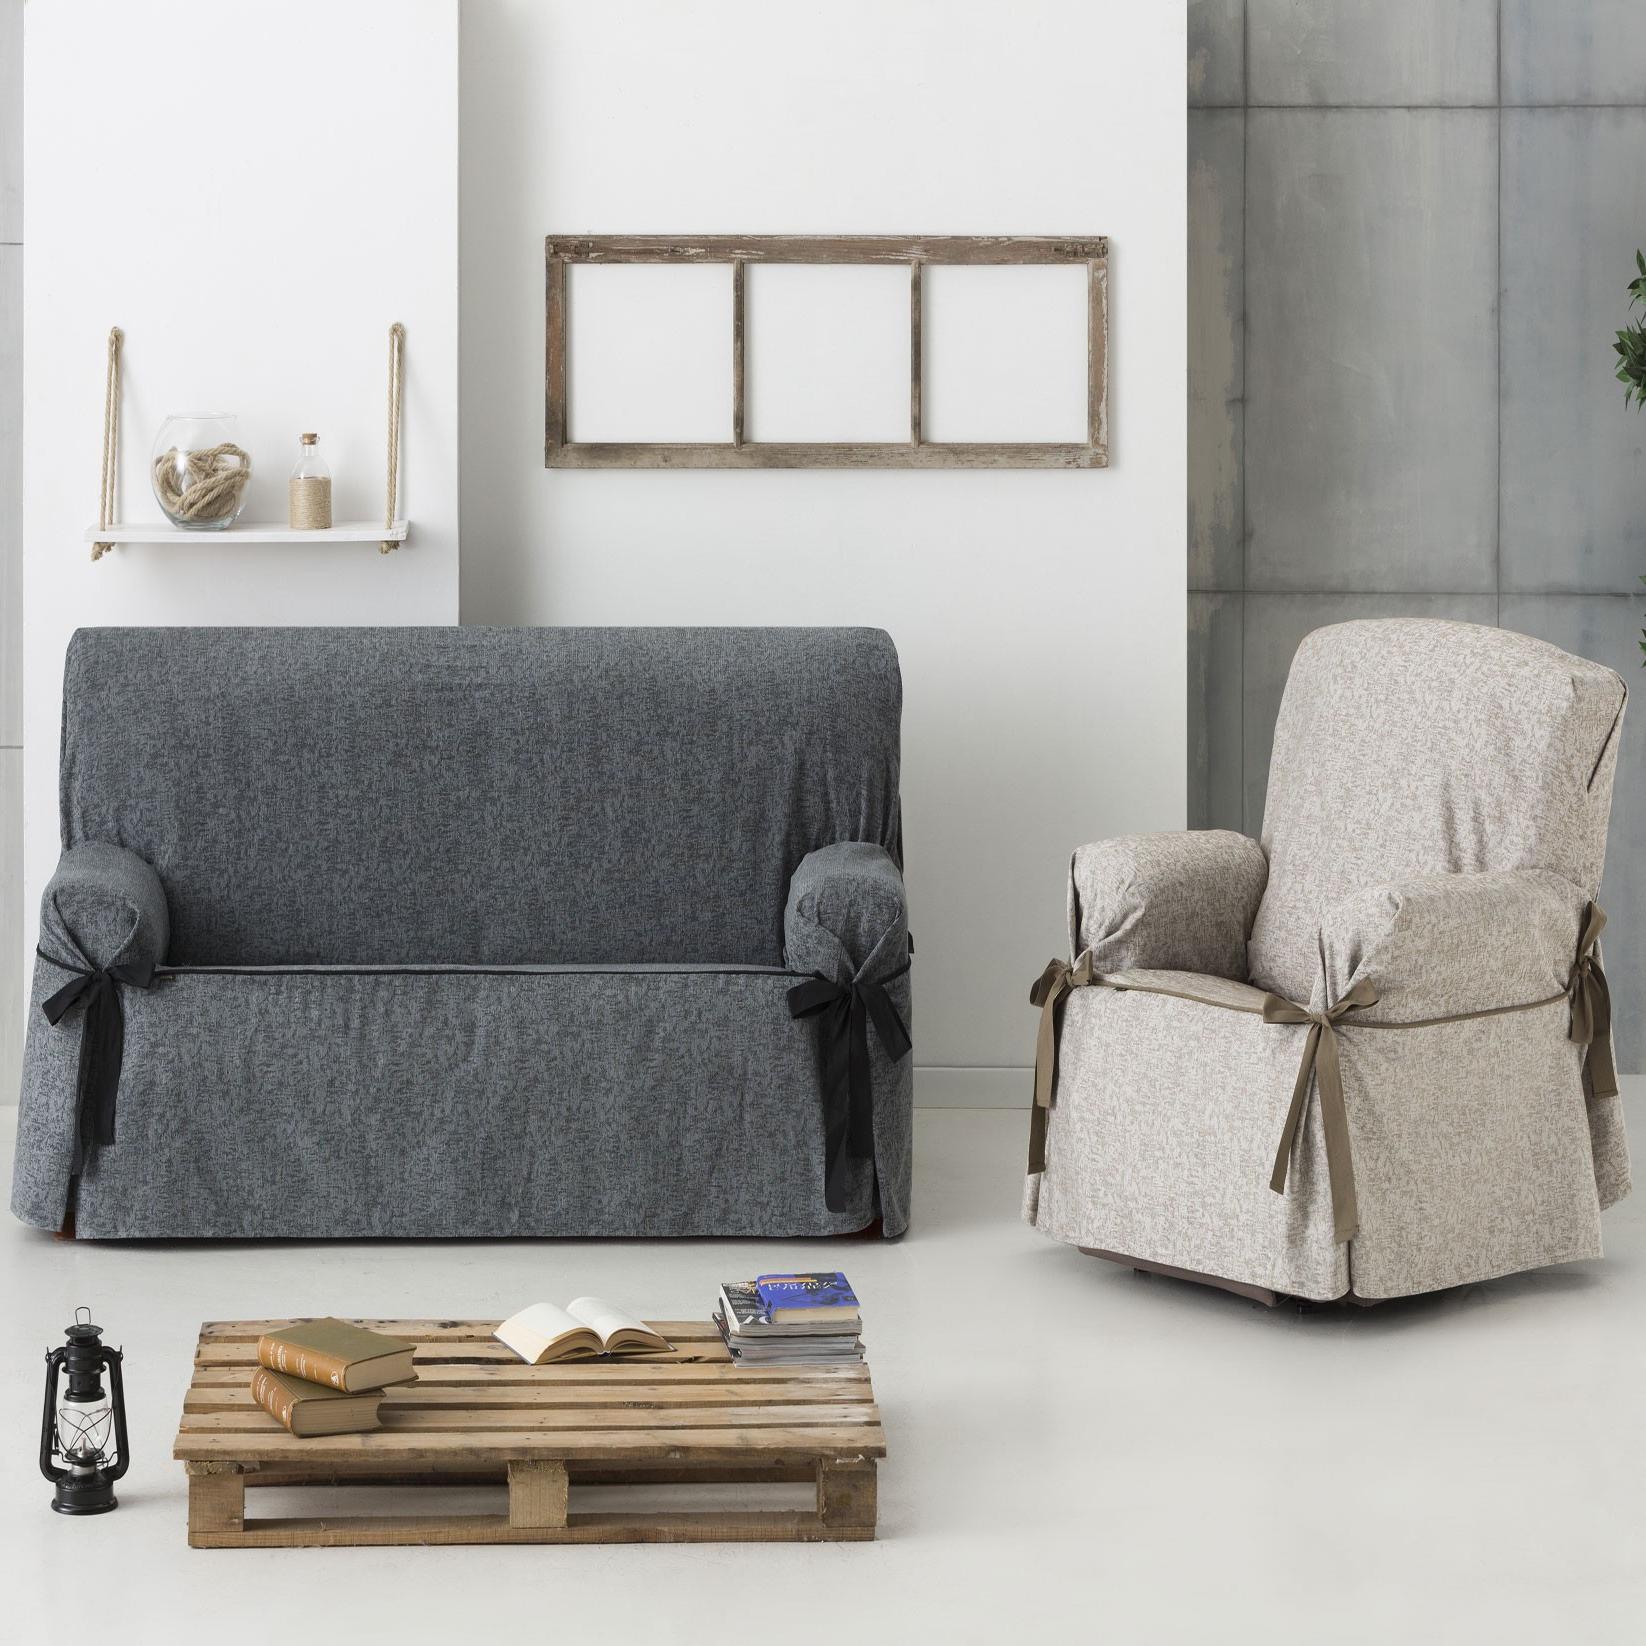 Funda sofa Gris Budm Funda sofà Universal Dream Lazos